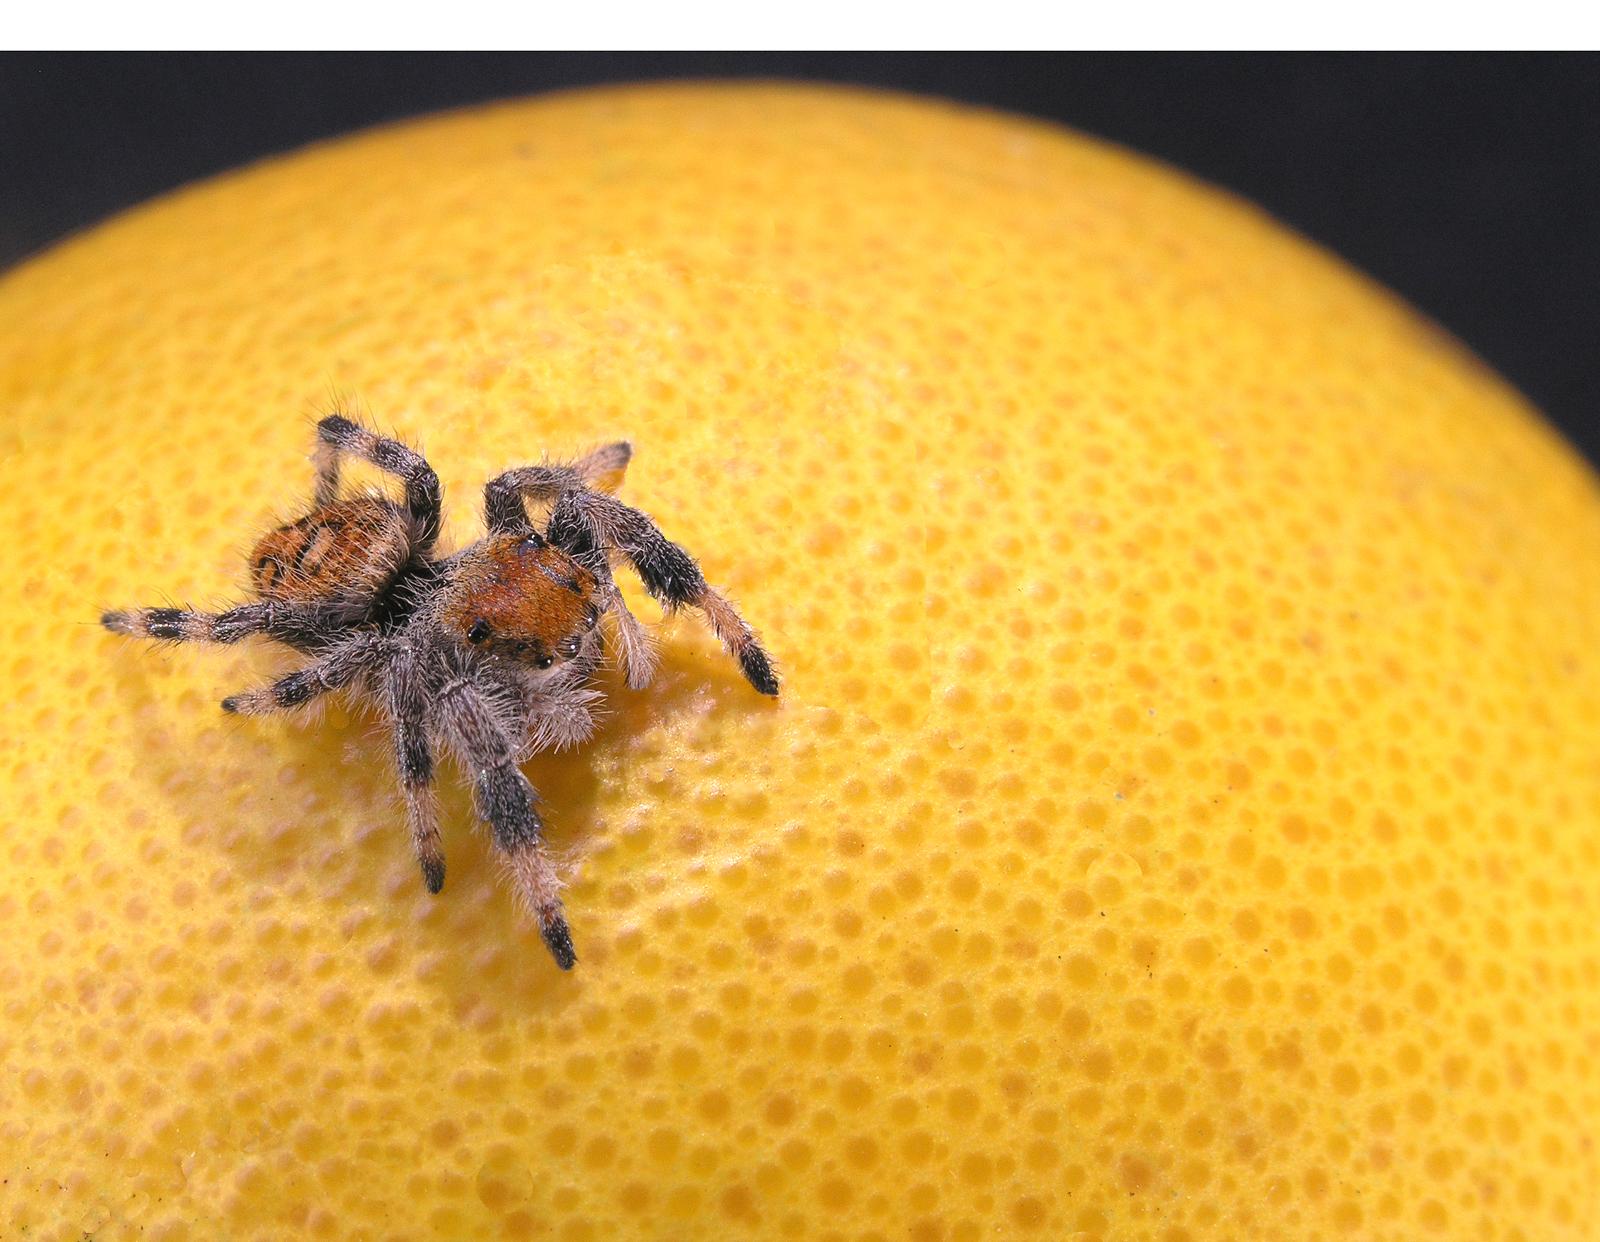 Jumping spider on an orange photo